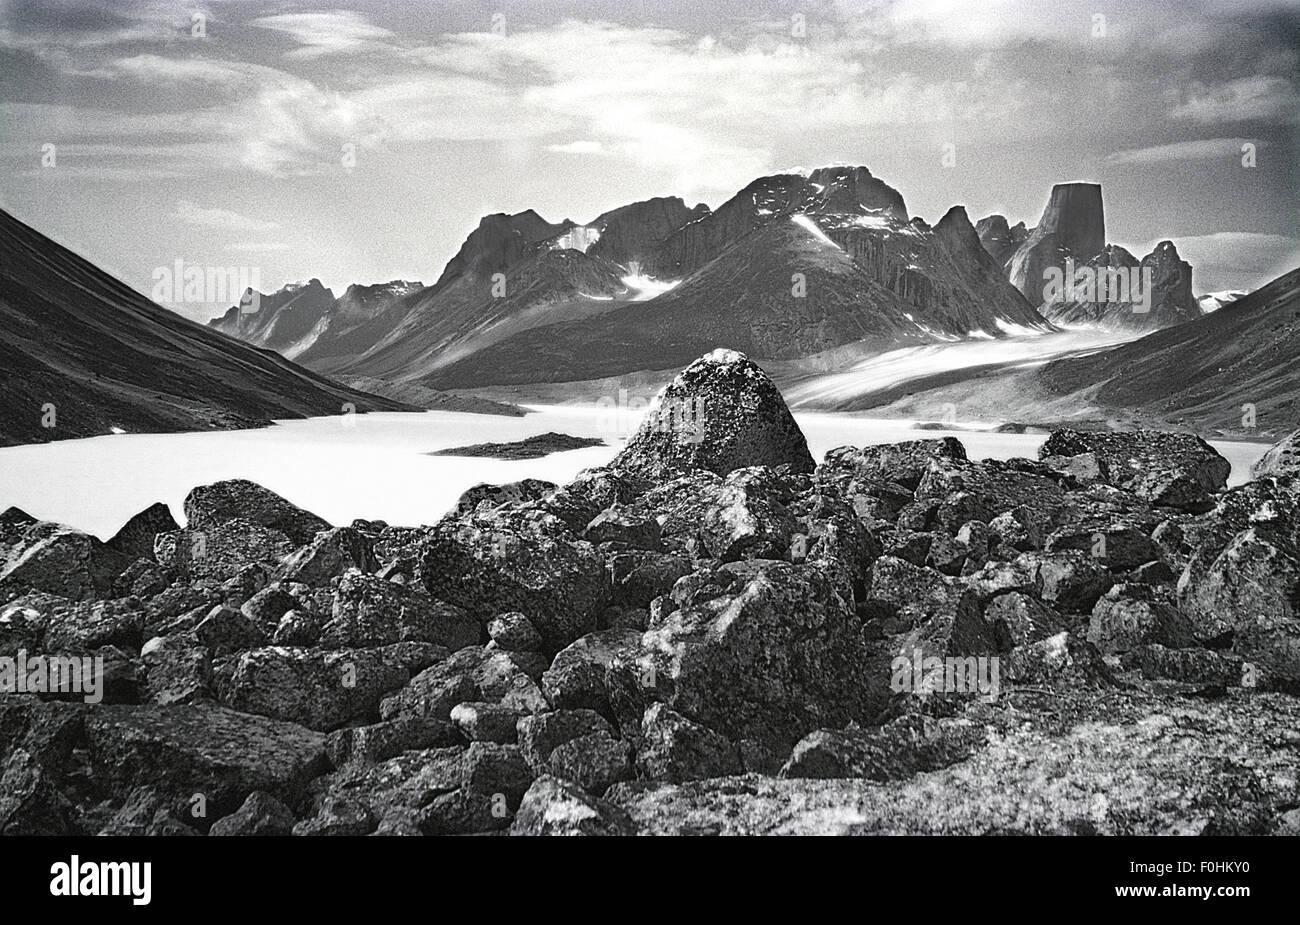 View of Mt. Asgard - Stock Image